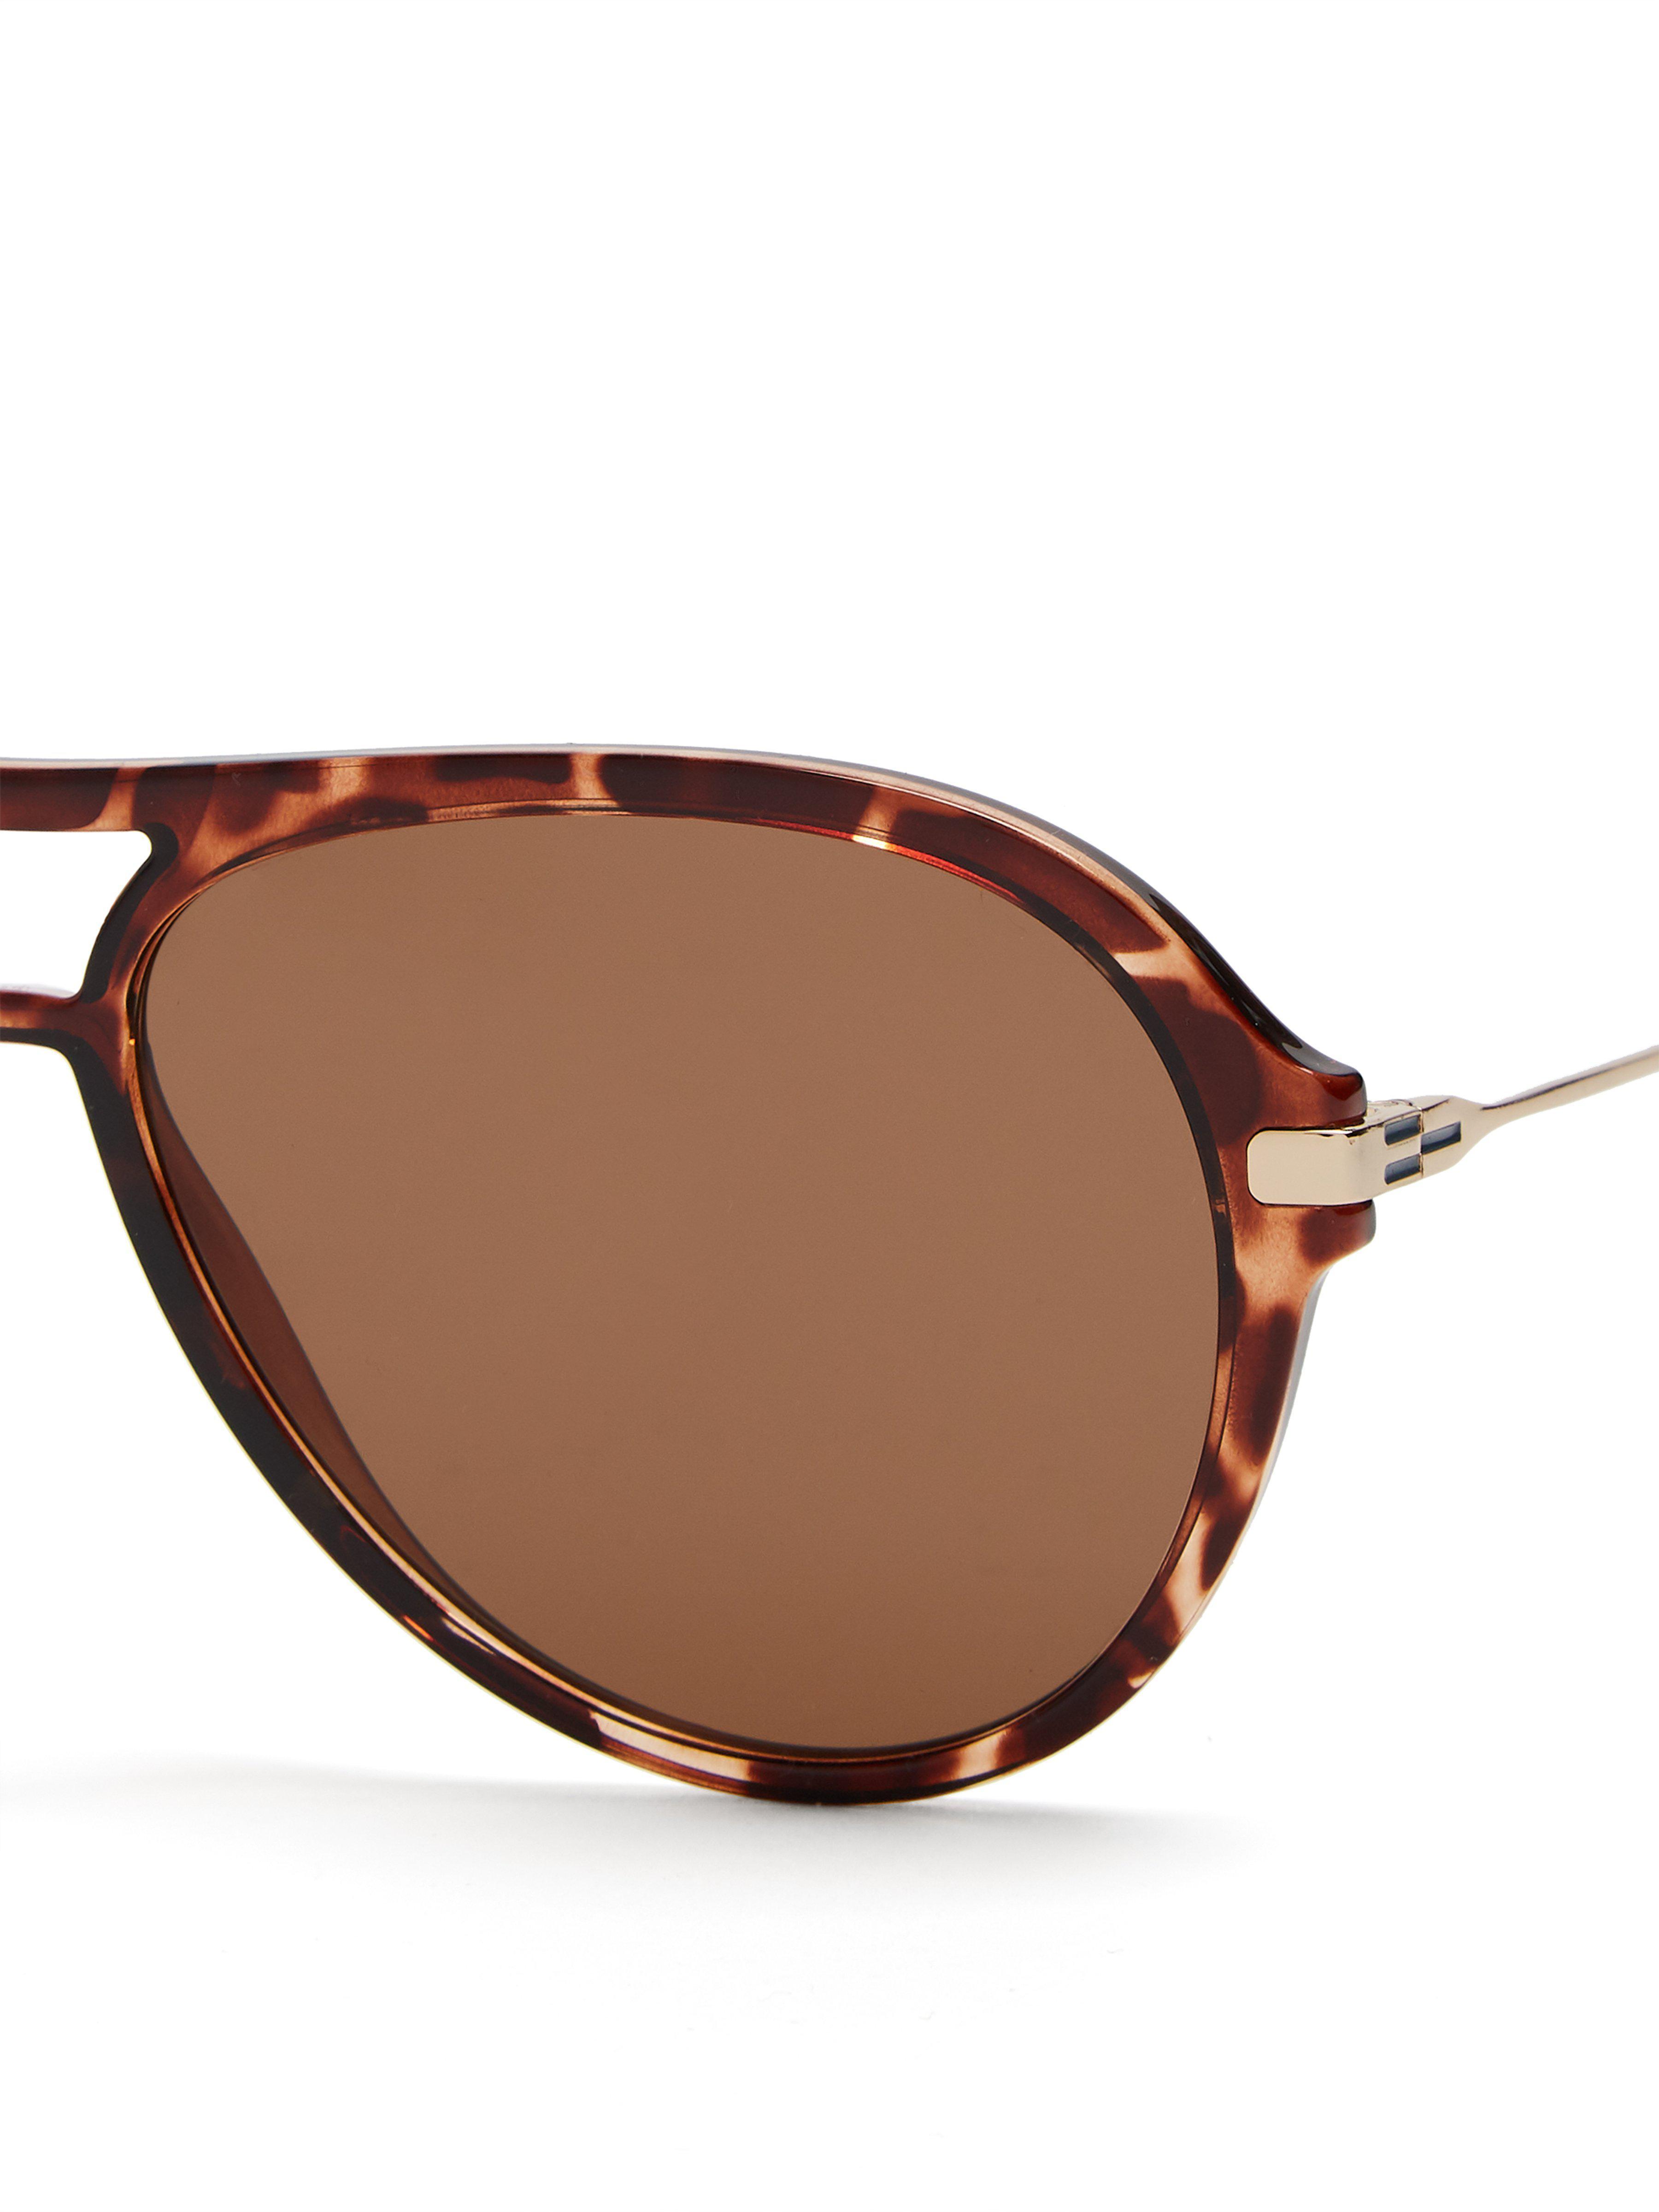 2e011c87242f Meeyye Symi Tortoiseshell Sunglasses in Brown - Lyst